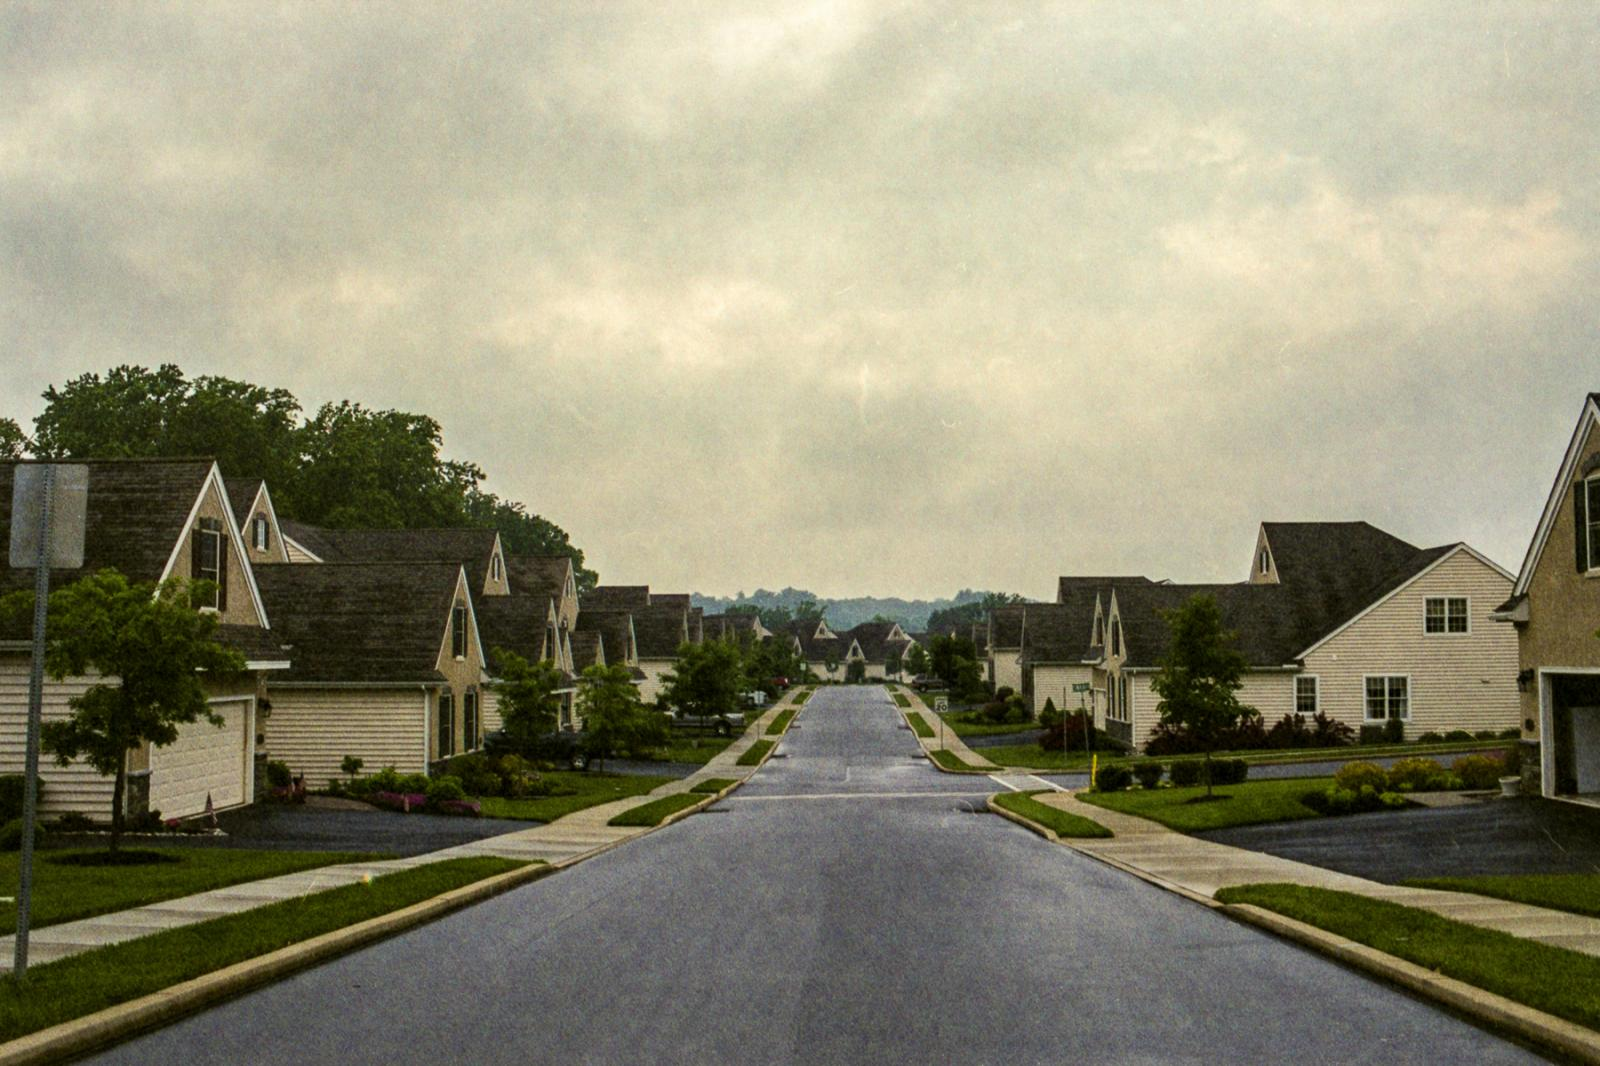 Harrogate planned community. Avondale, PA.